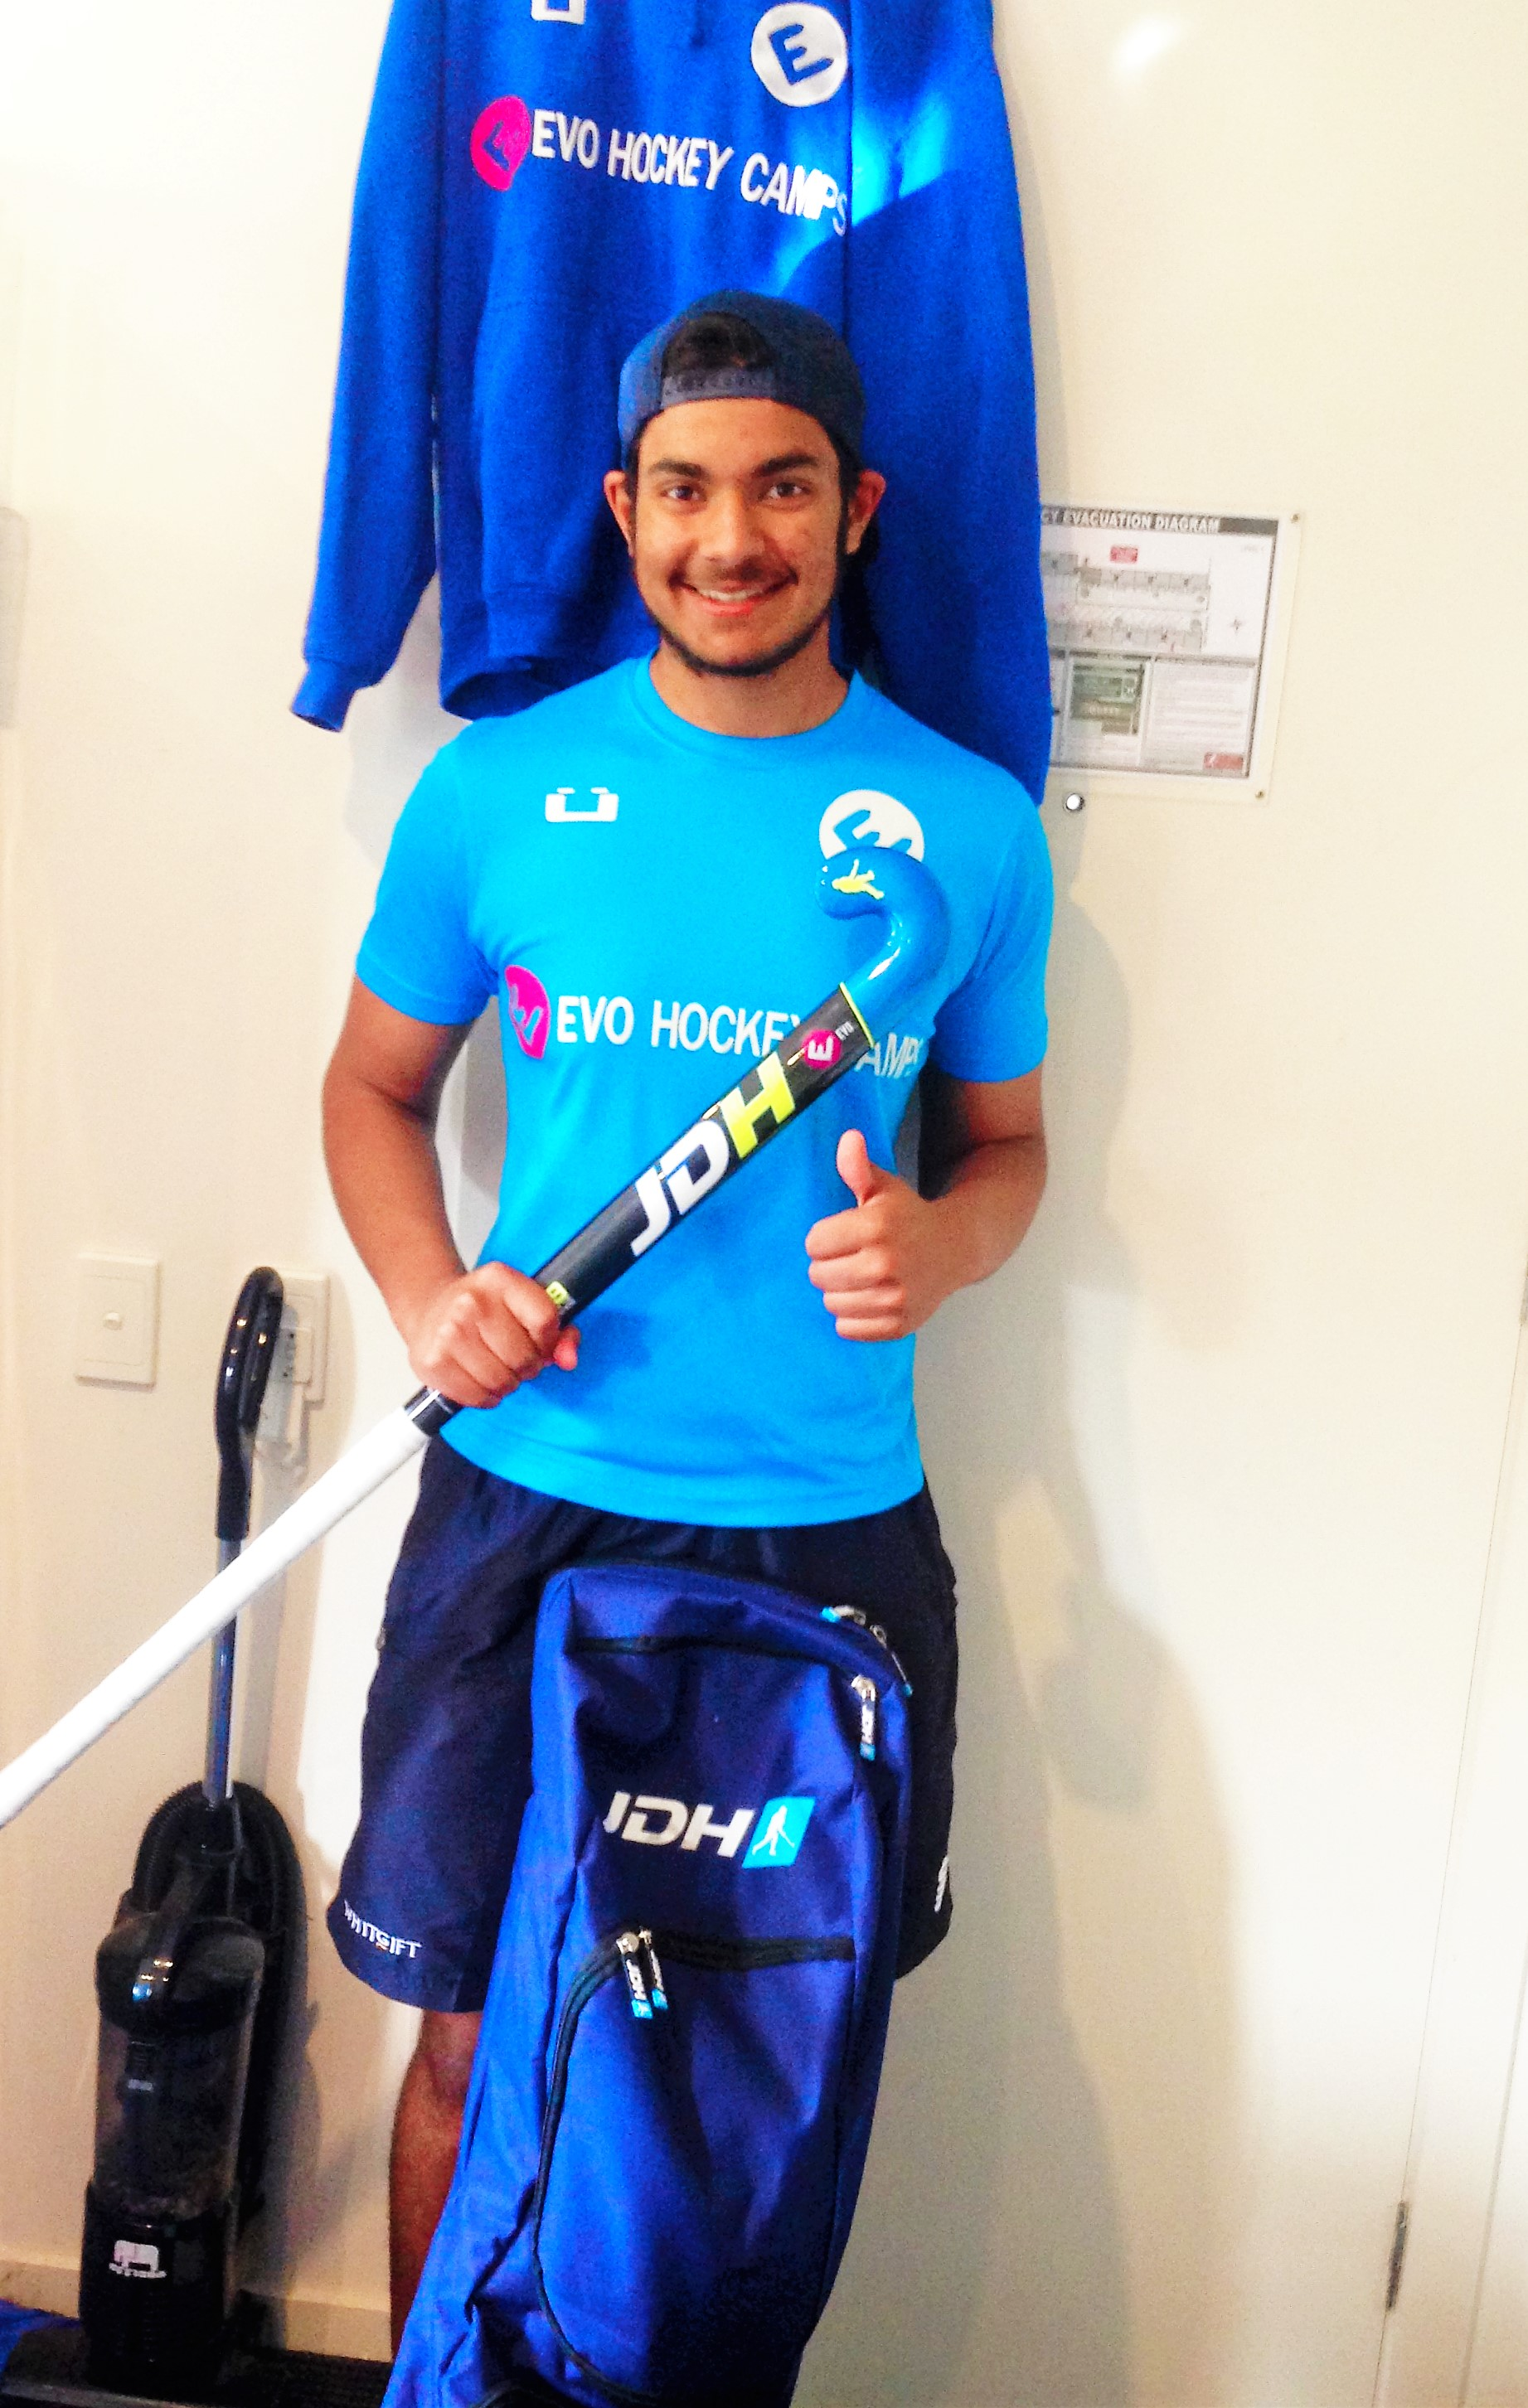 Johann with his EVO Hockey & JDH gear